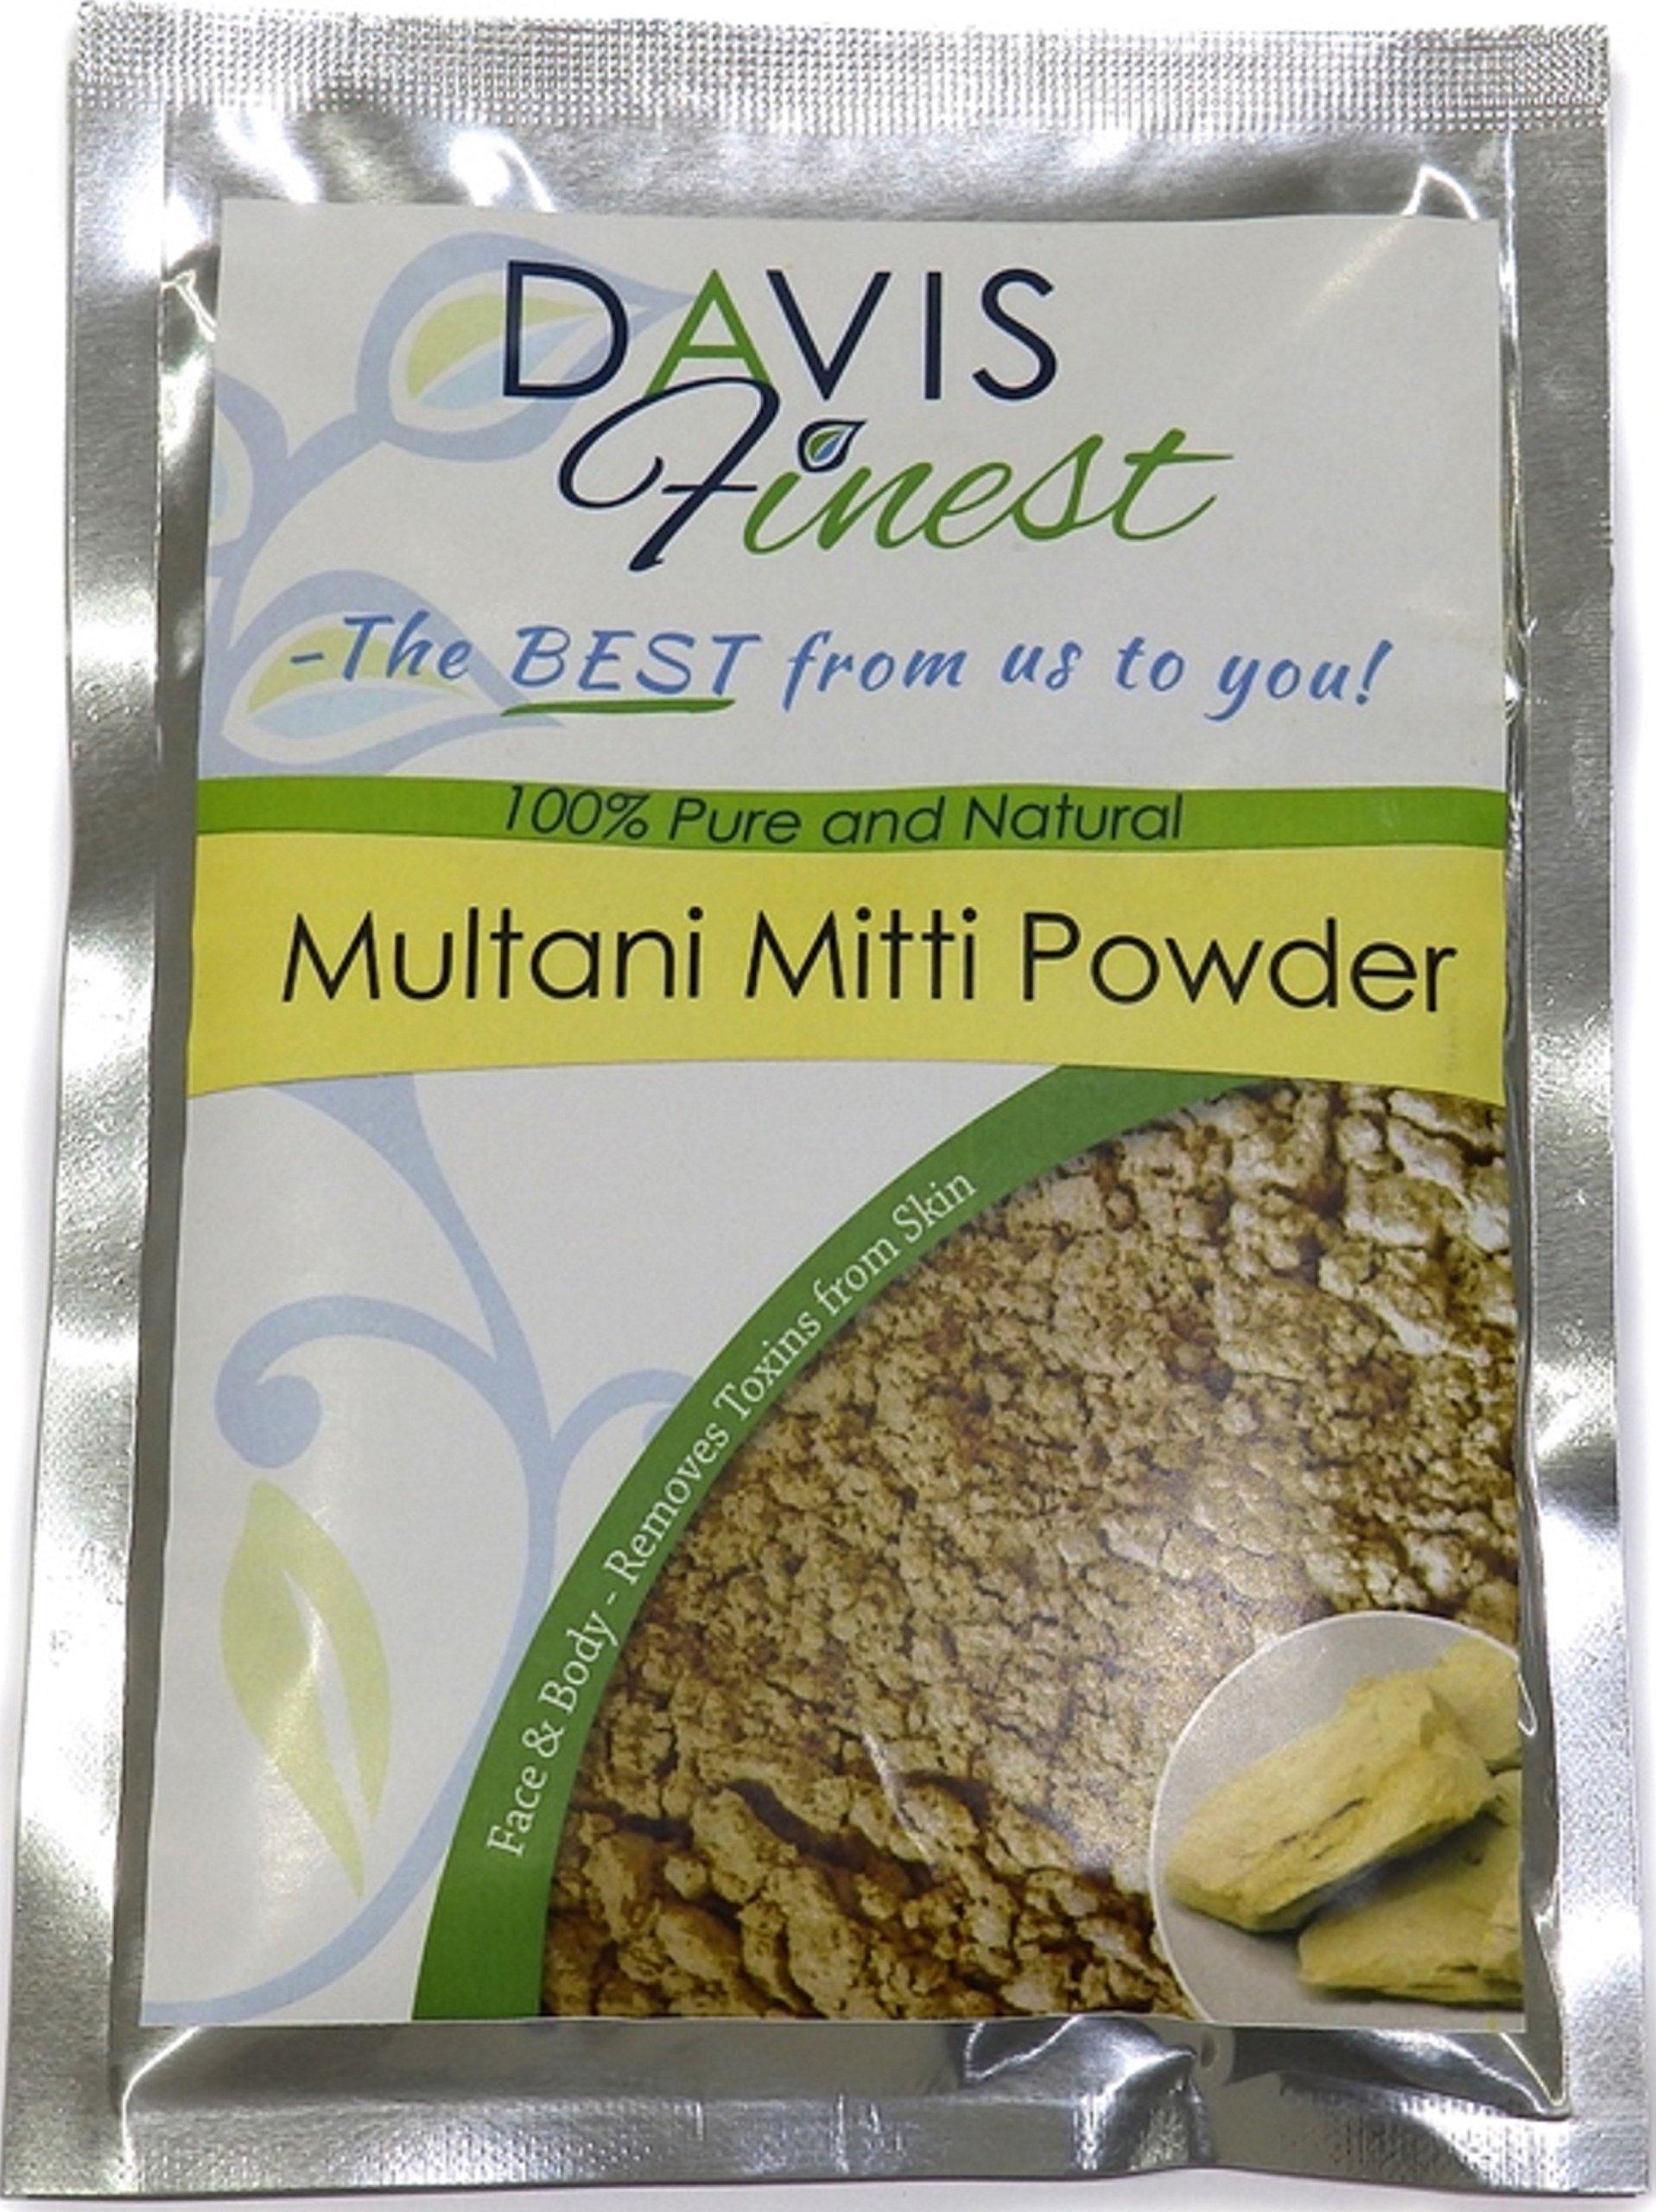 Davis Finest Multani Mitti Powder for Face Hair Skin Lightening Brightening, Fullers Earth Indian Healing Bentonite Clay Pore Minimizer 100g